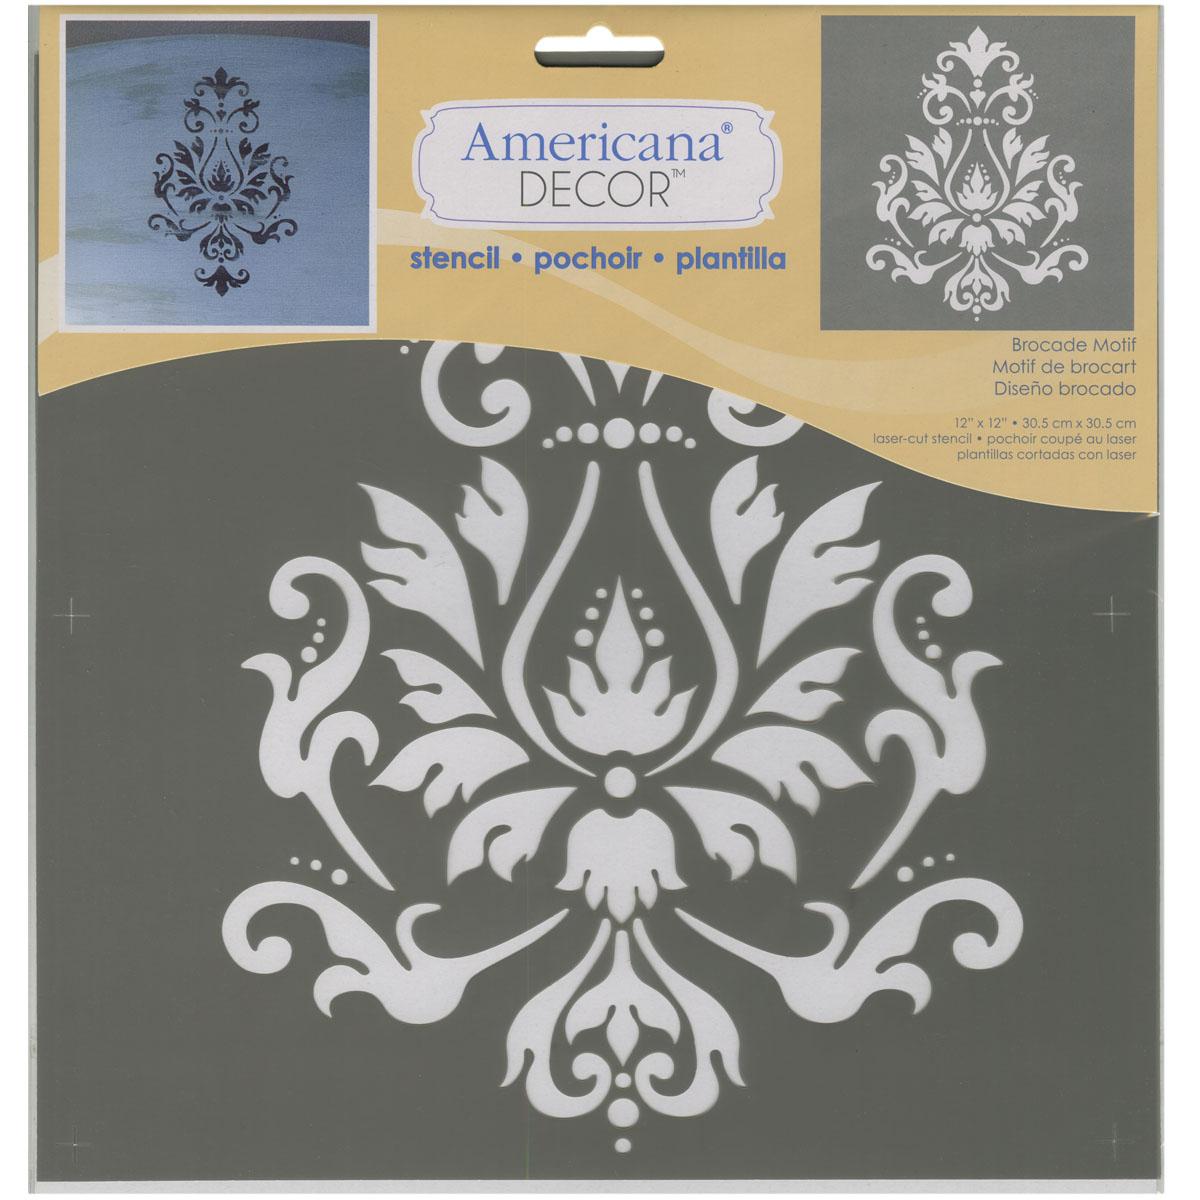 "Americana Decor Stencil 12""X12"" Brocade Motif"